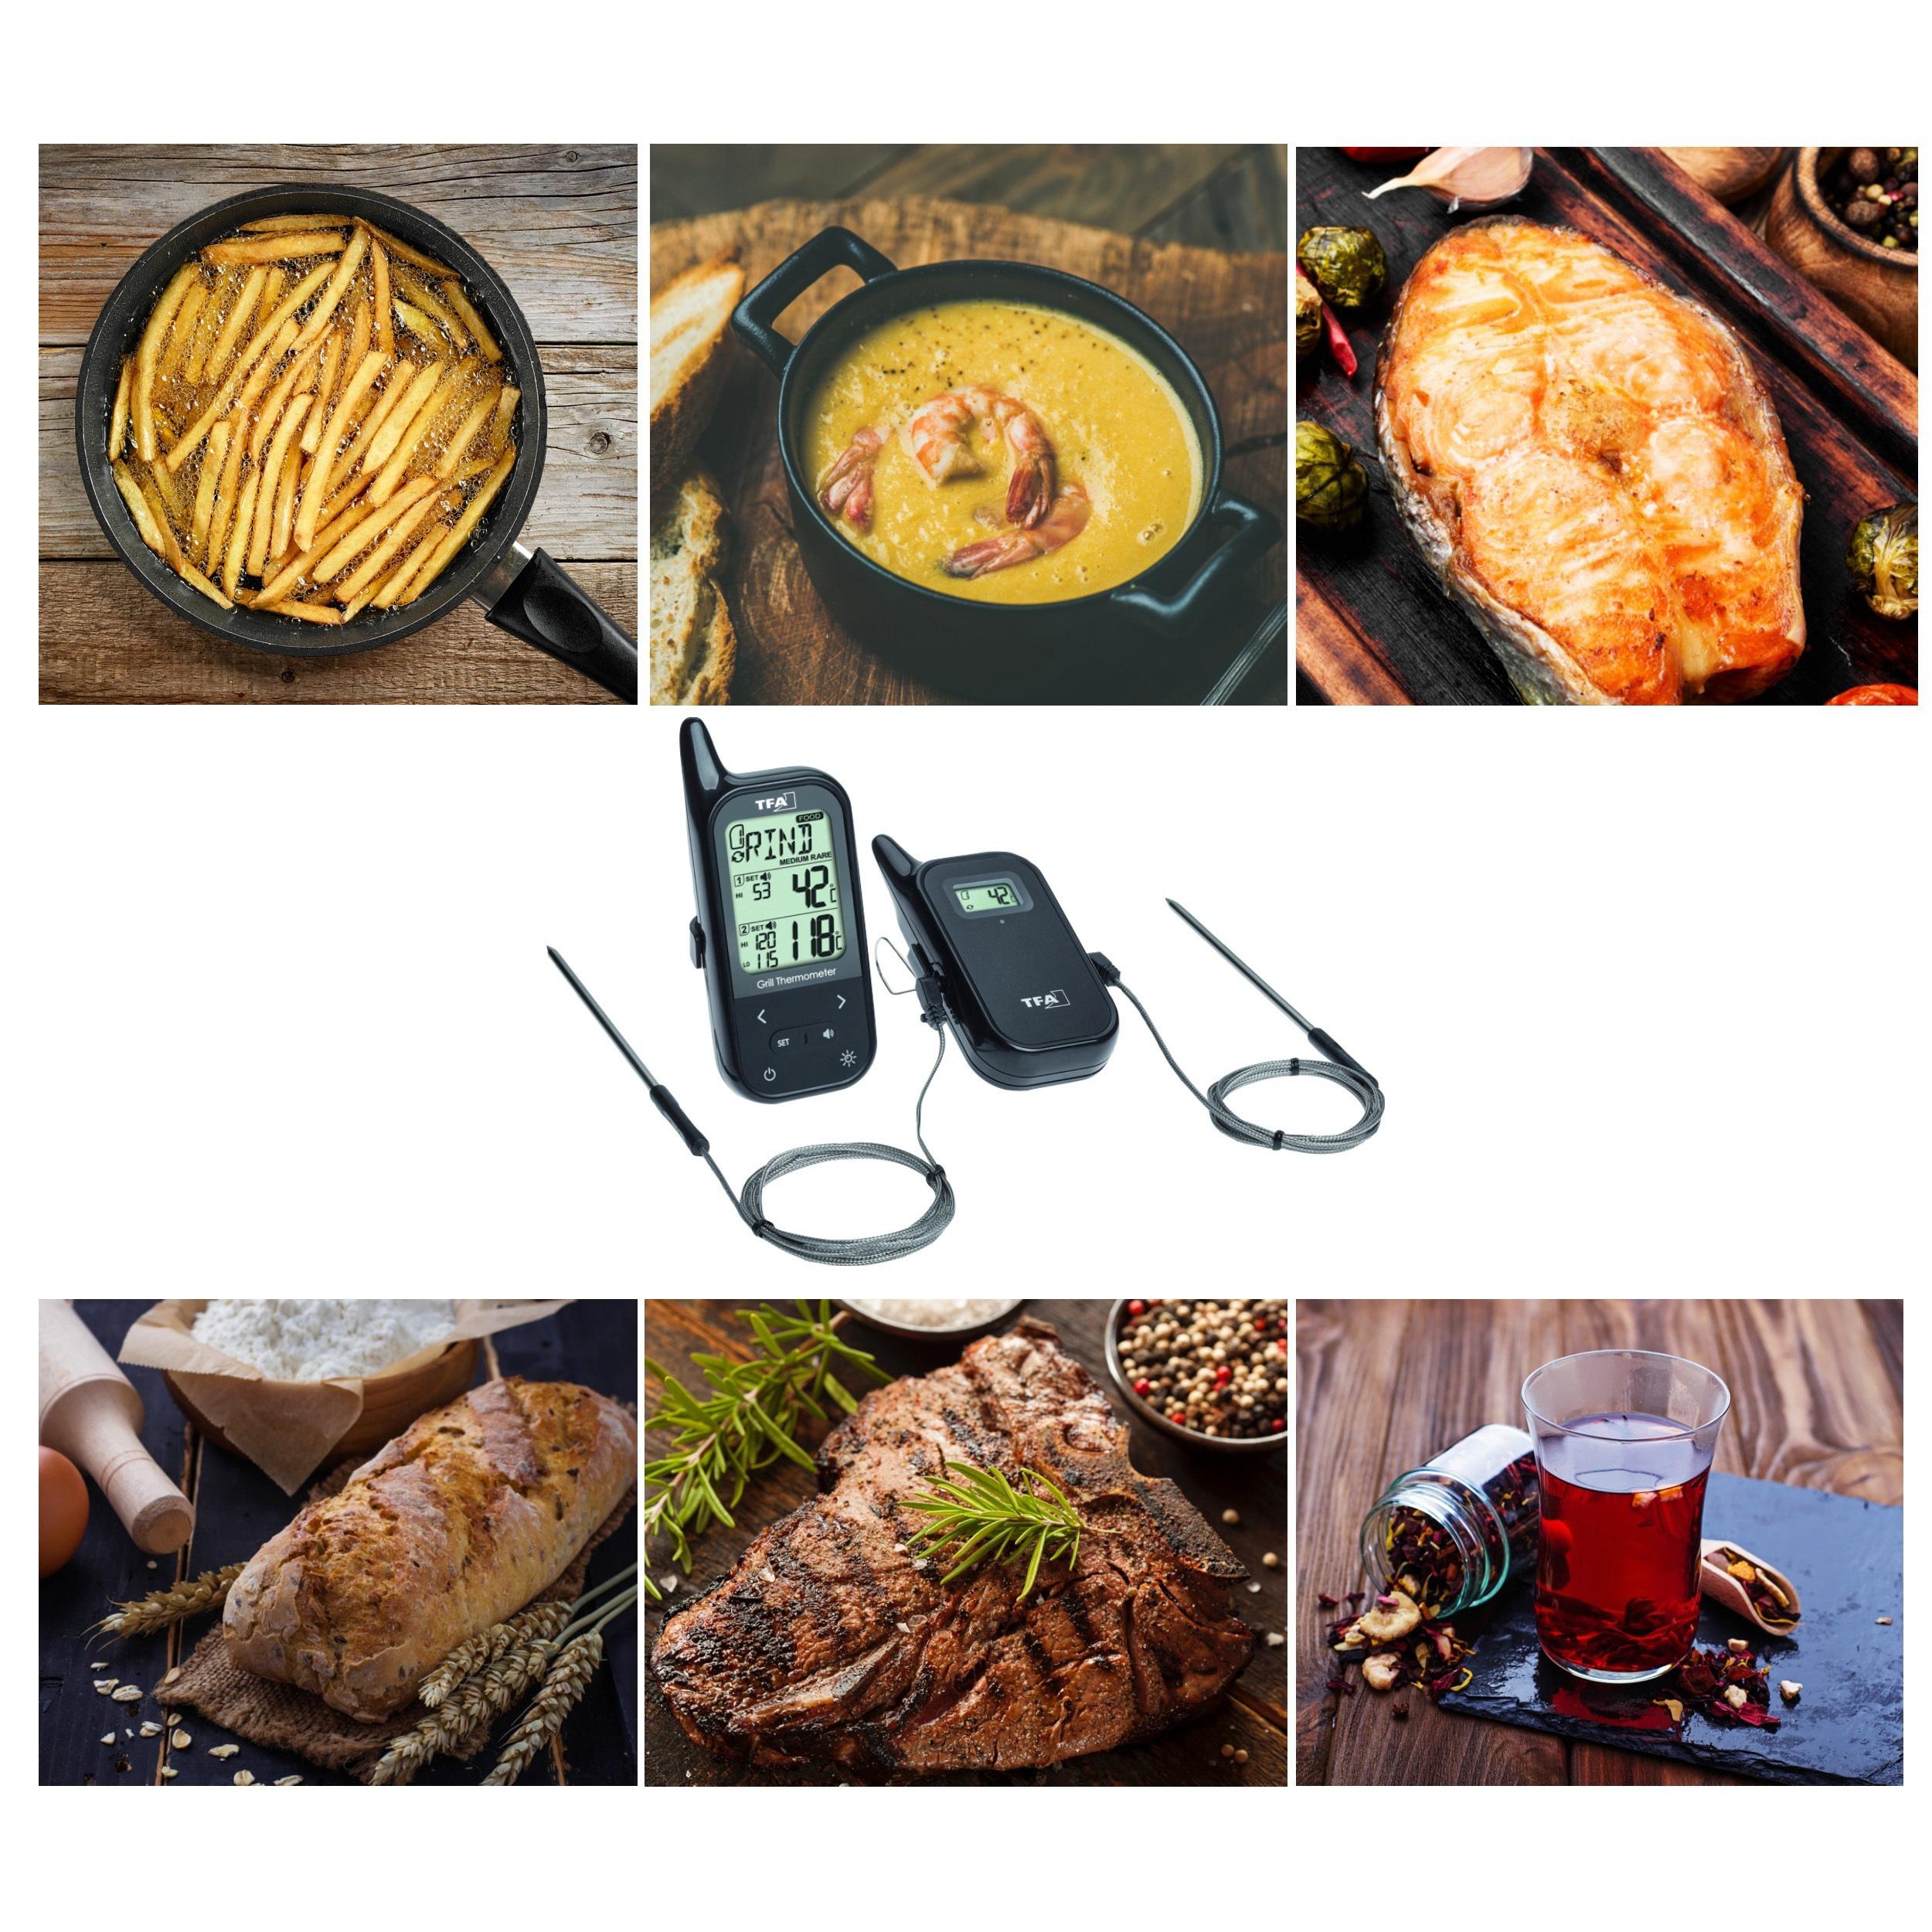 14-1511-01-funk-grill-braten-ofenthermometer-küchen-chef-twin-anwendung-1200x1200px.jpg